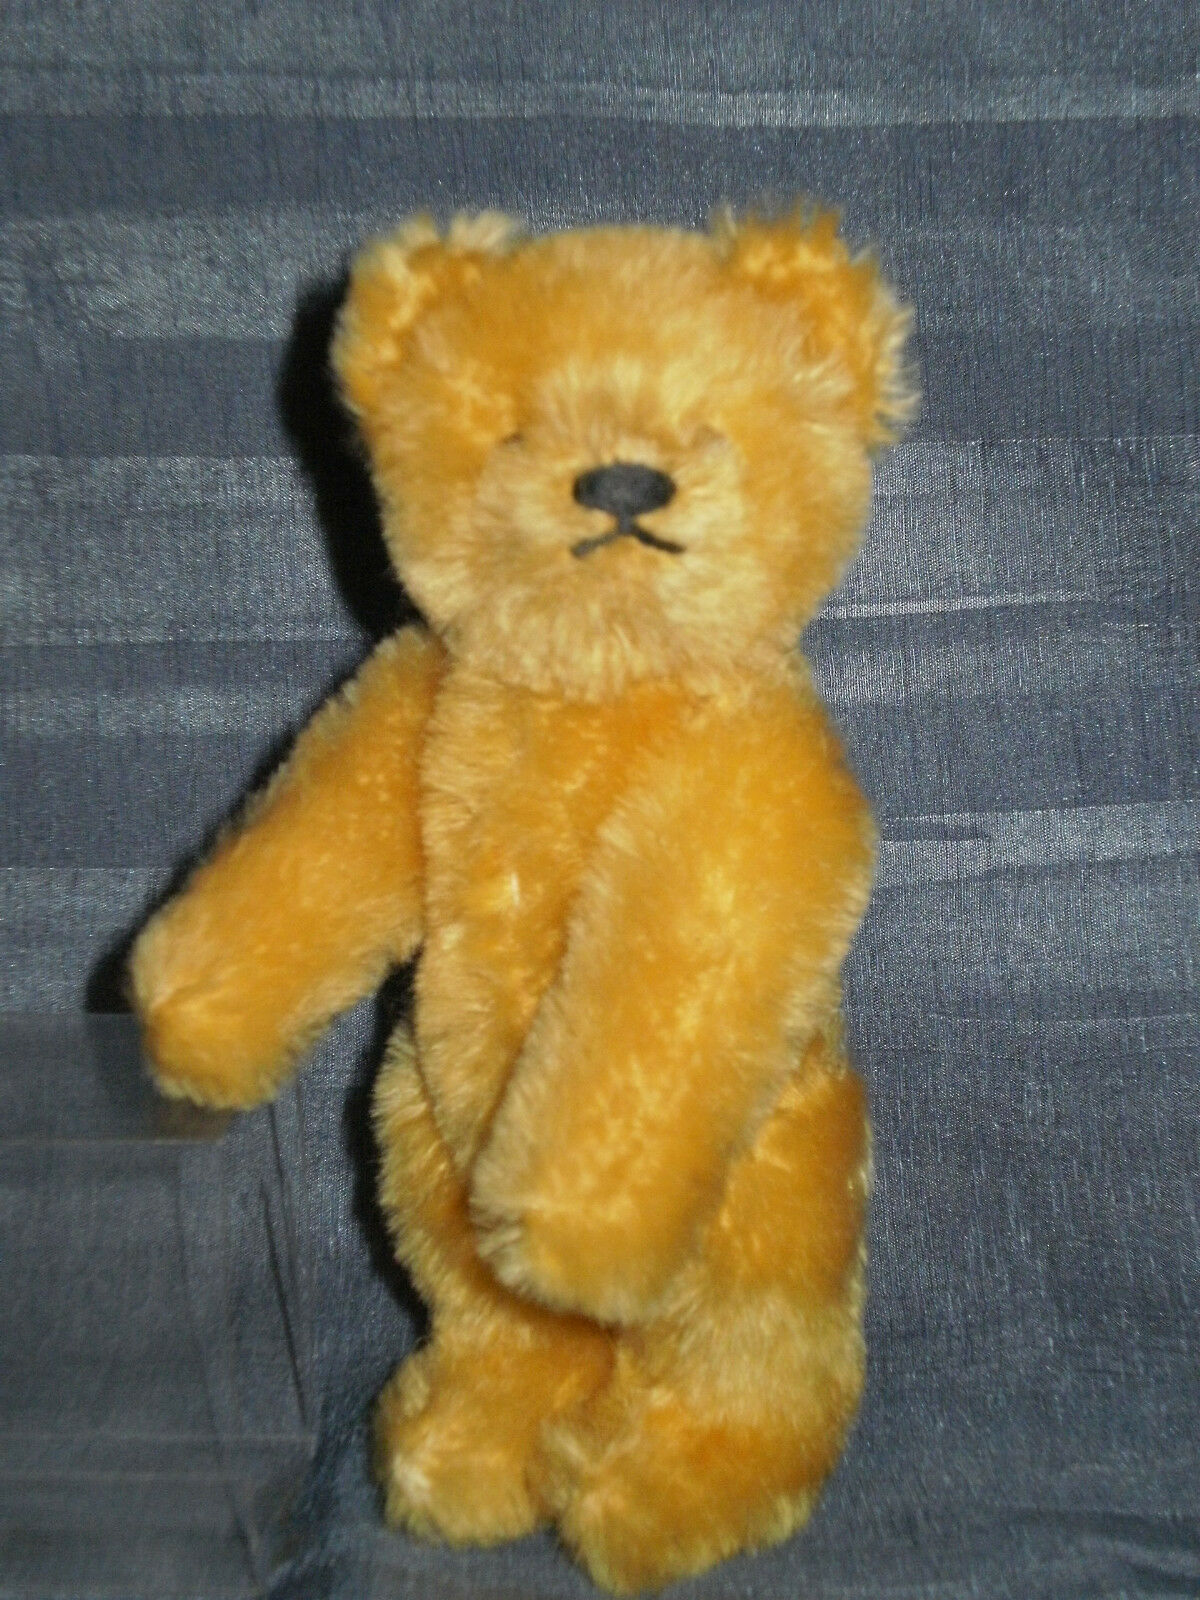 VINTAGE VINTAGE VINTAGE CUTE STEIFF JOINTED oroEN TEDDY BEAR 5.91  no IDs a1dea4